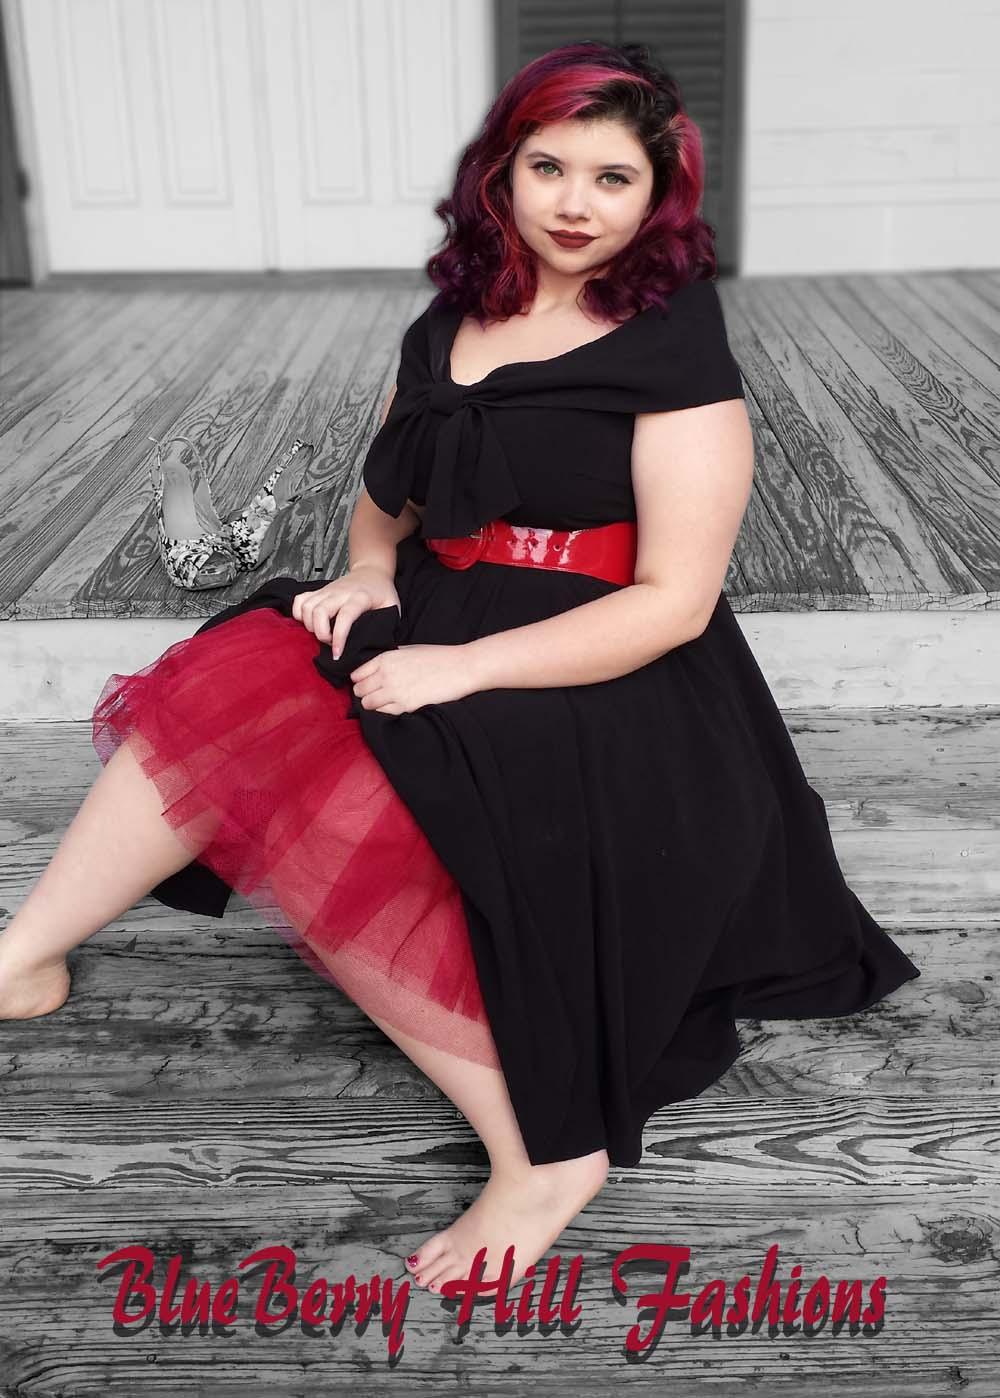 Blueberry hill fashions plus size rockabilly clothing for for Plus size rockabilly wedding dresses